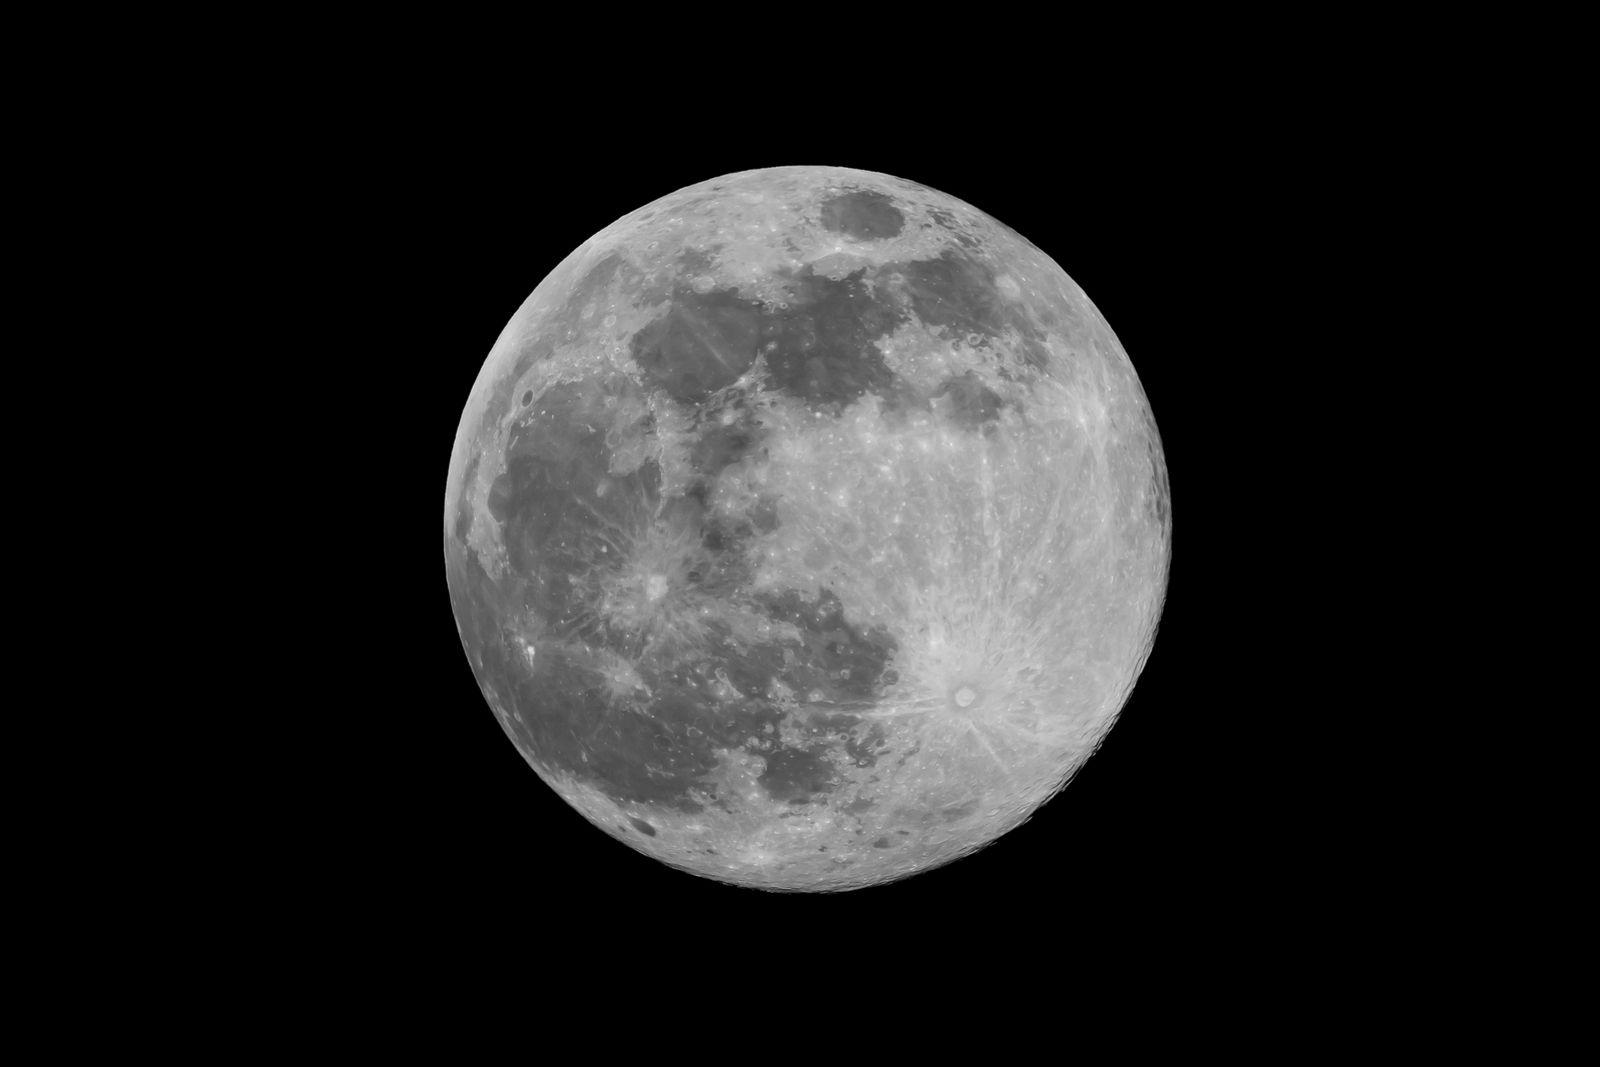 Pleine lune de confinement